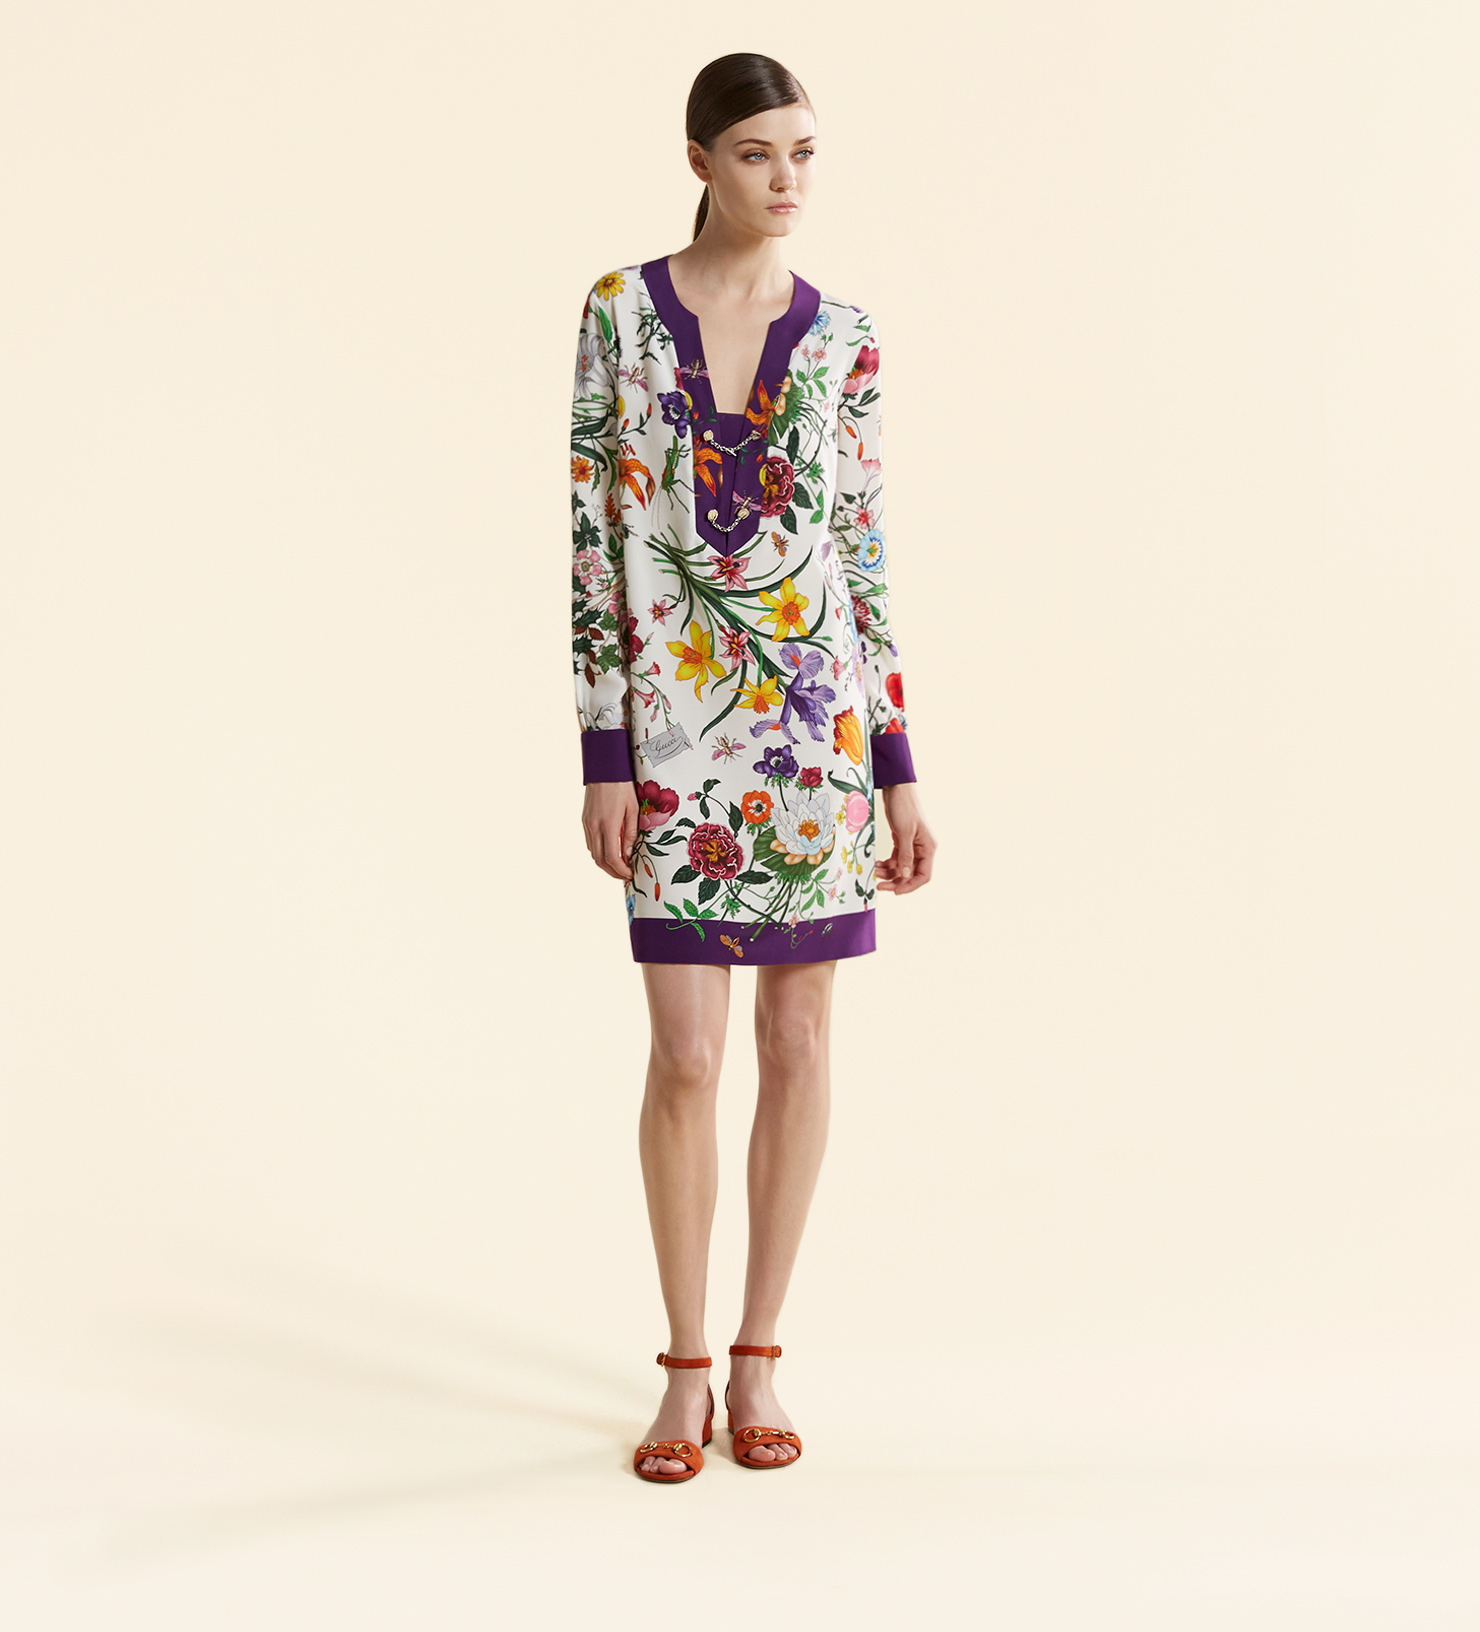 Borse Da Cerimonia Gucci : Gucci silk cr?pe de chine long sleeve dress lyst